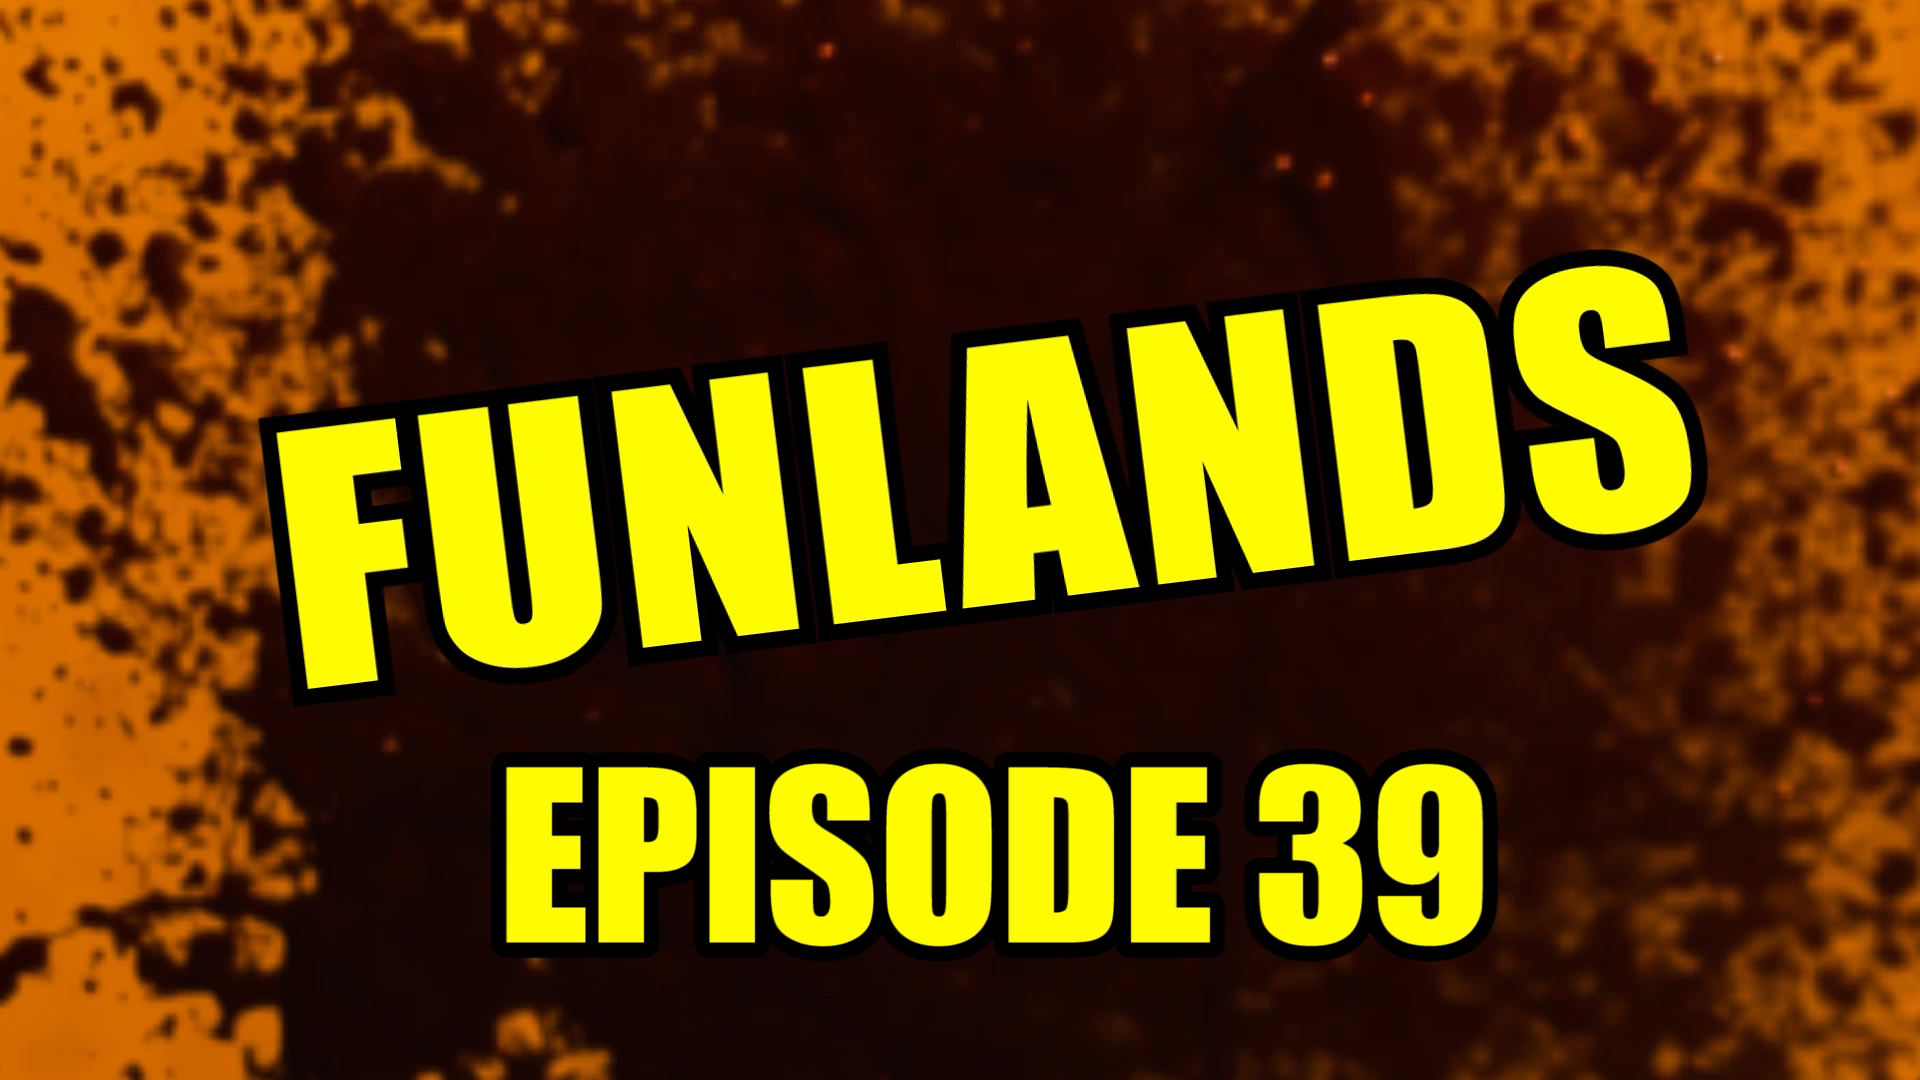 Funlands Episode 39.jpg